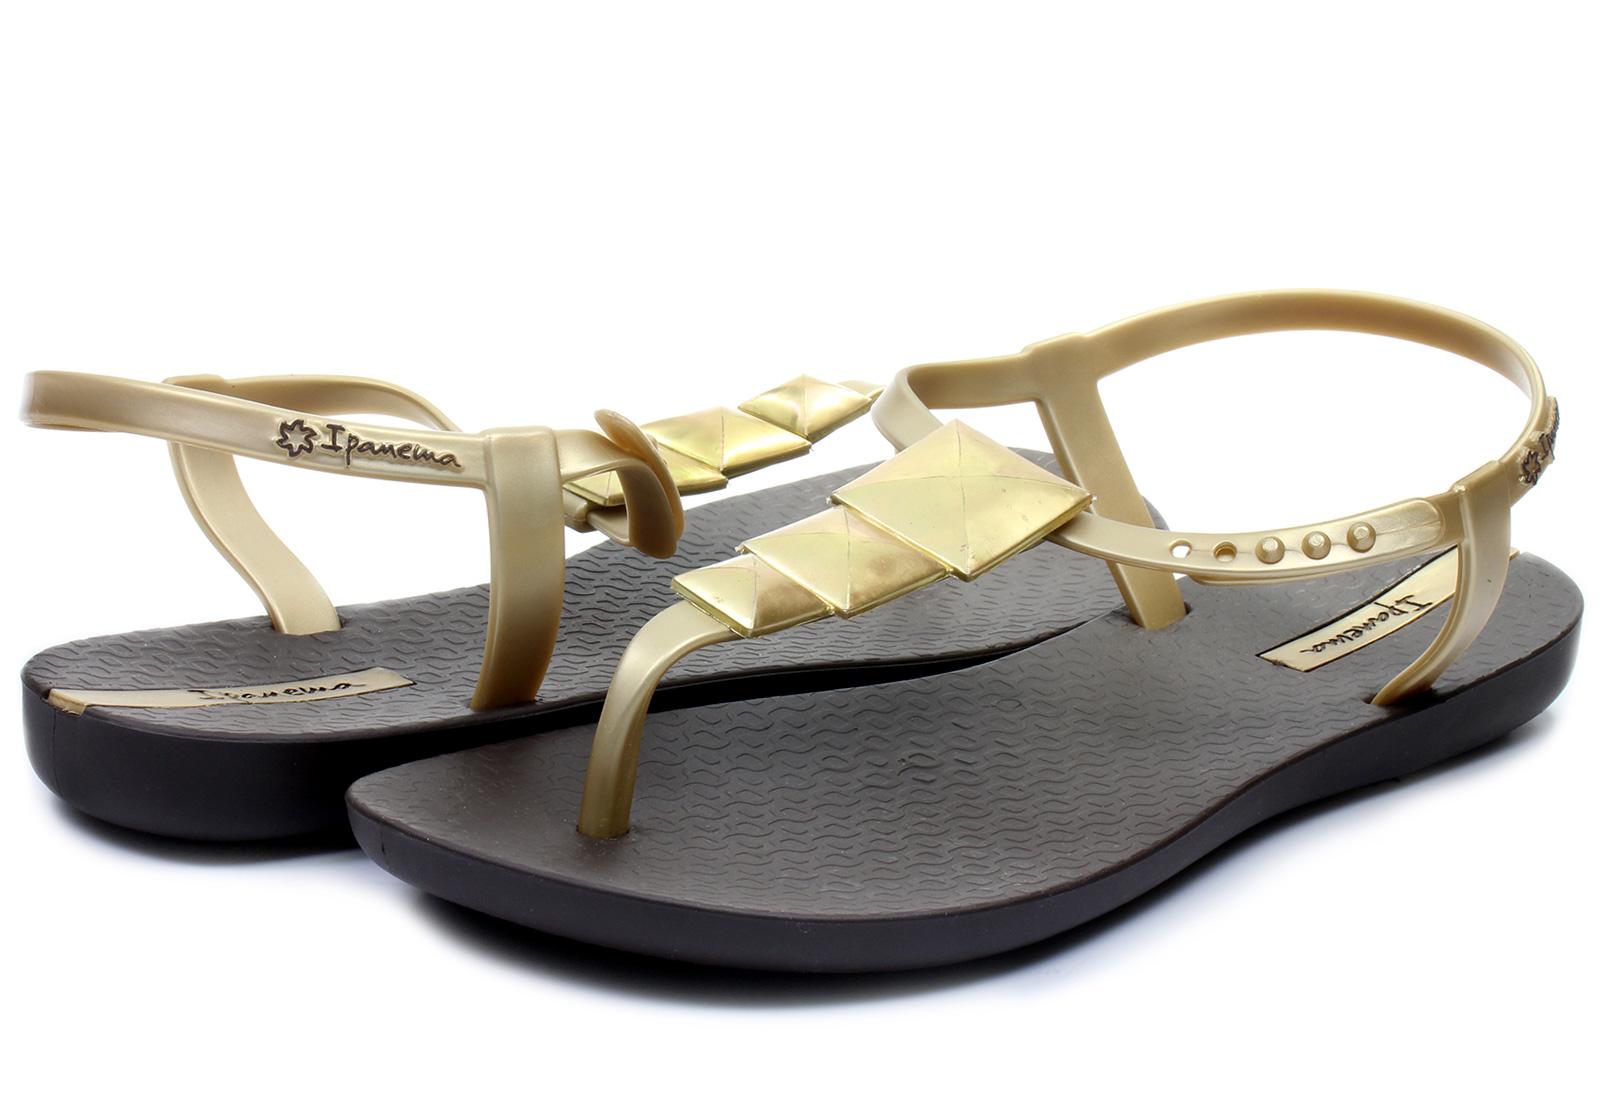 Ipanema Sandals - Charm Sandal - 81075-21053 - Online Shop ...